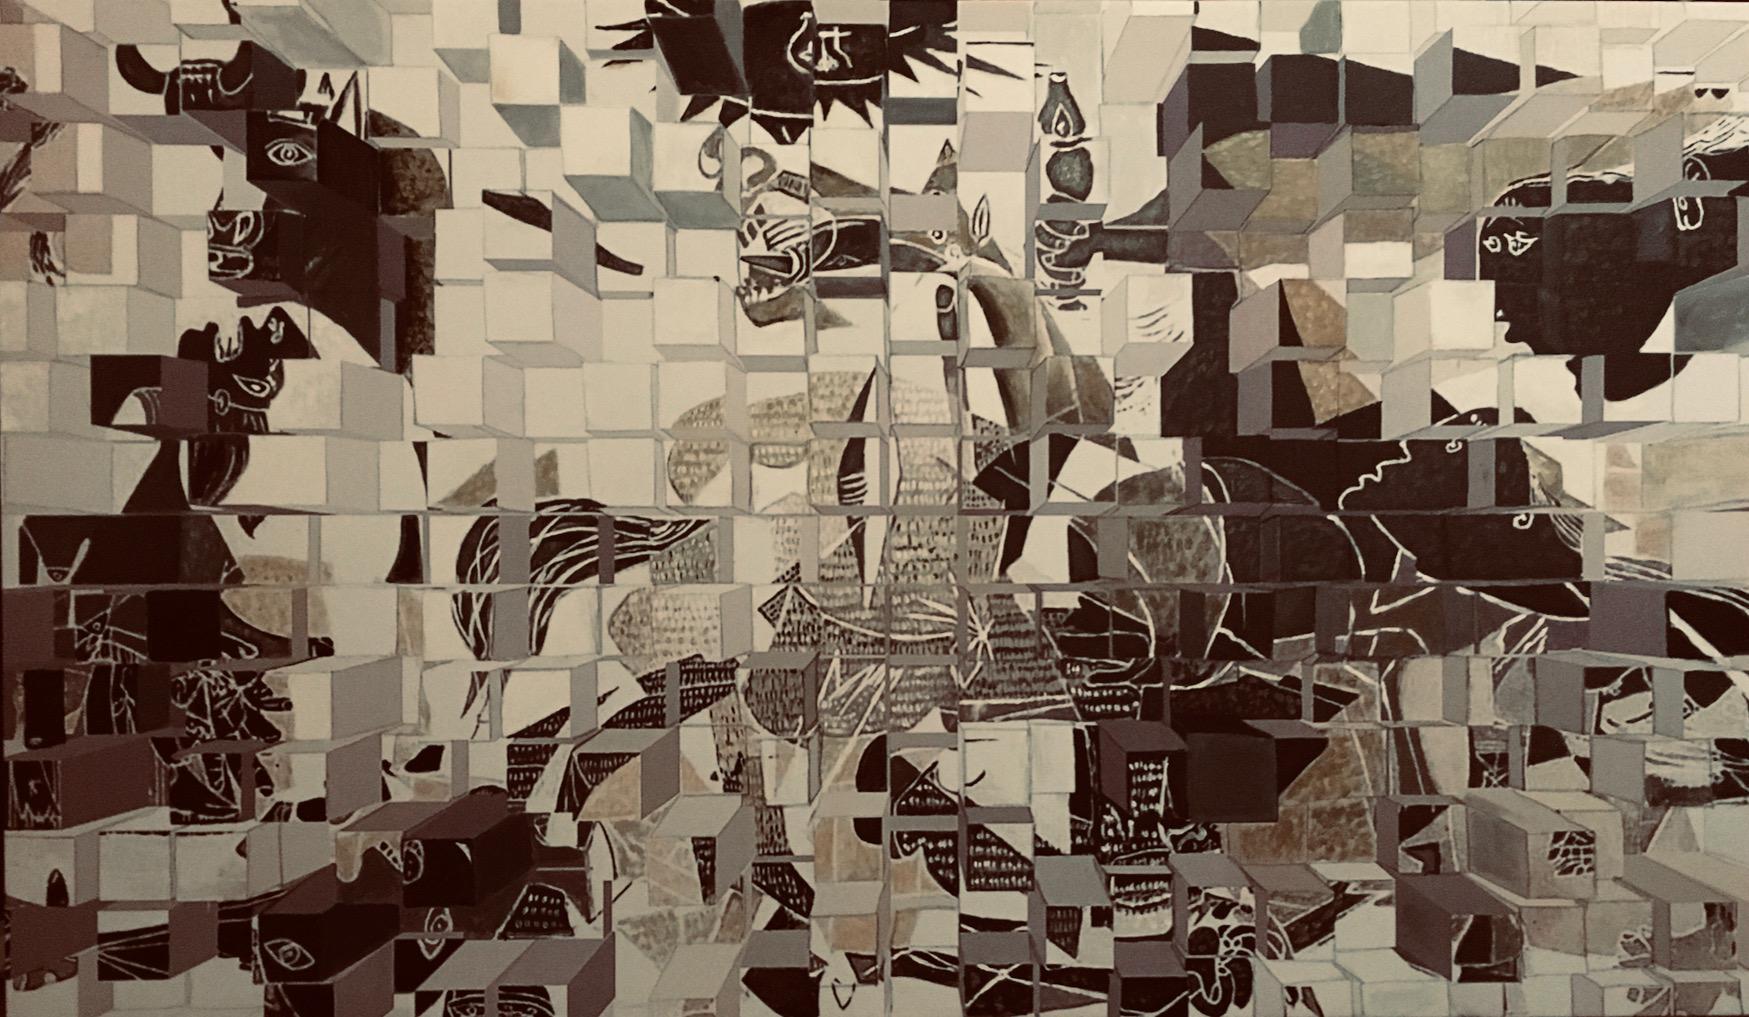 Cubing Cubism